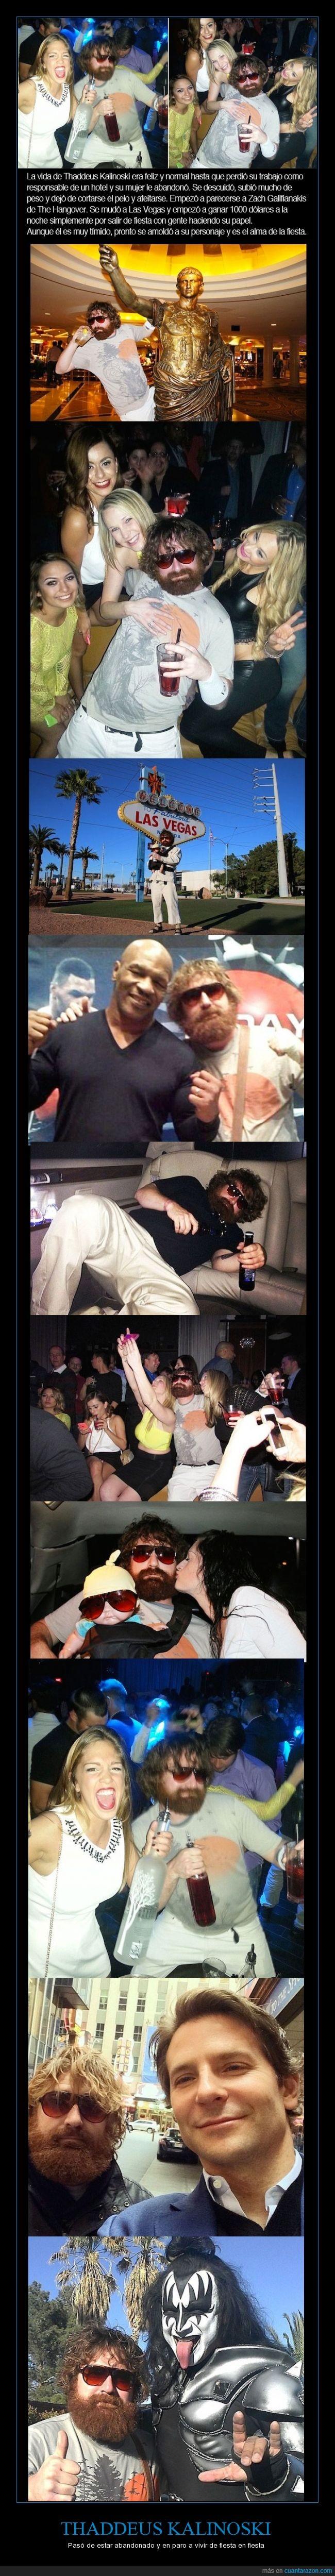 Bradley Cooper,fiesta,Gene Simmons,Mike Tyson,Resacón en las Vegas,Thaddeus Kalinoski,The Hangover,Zack Galifianakis